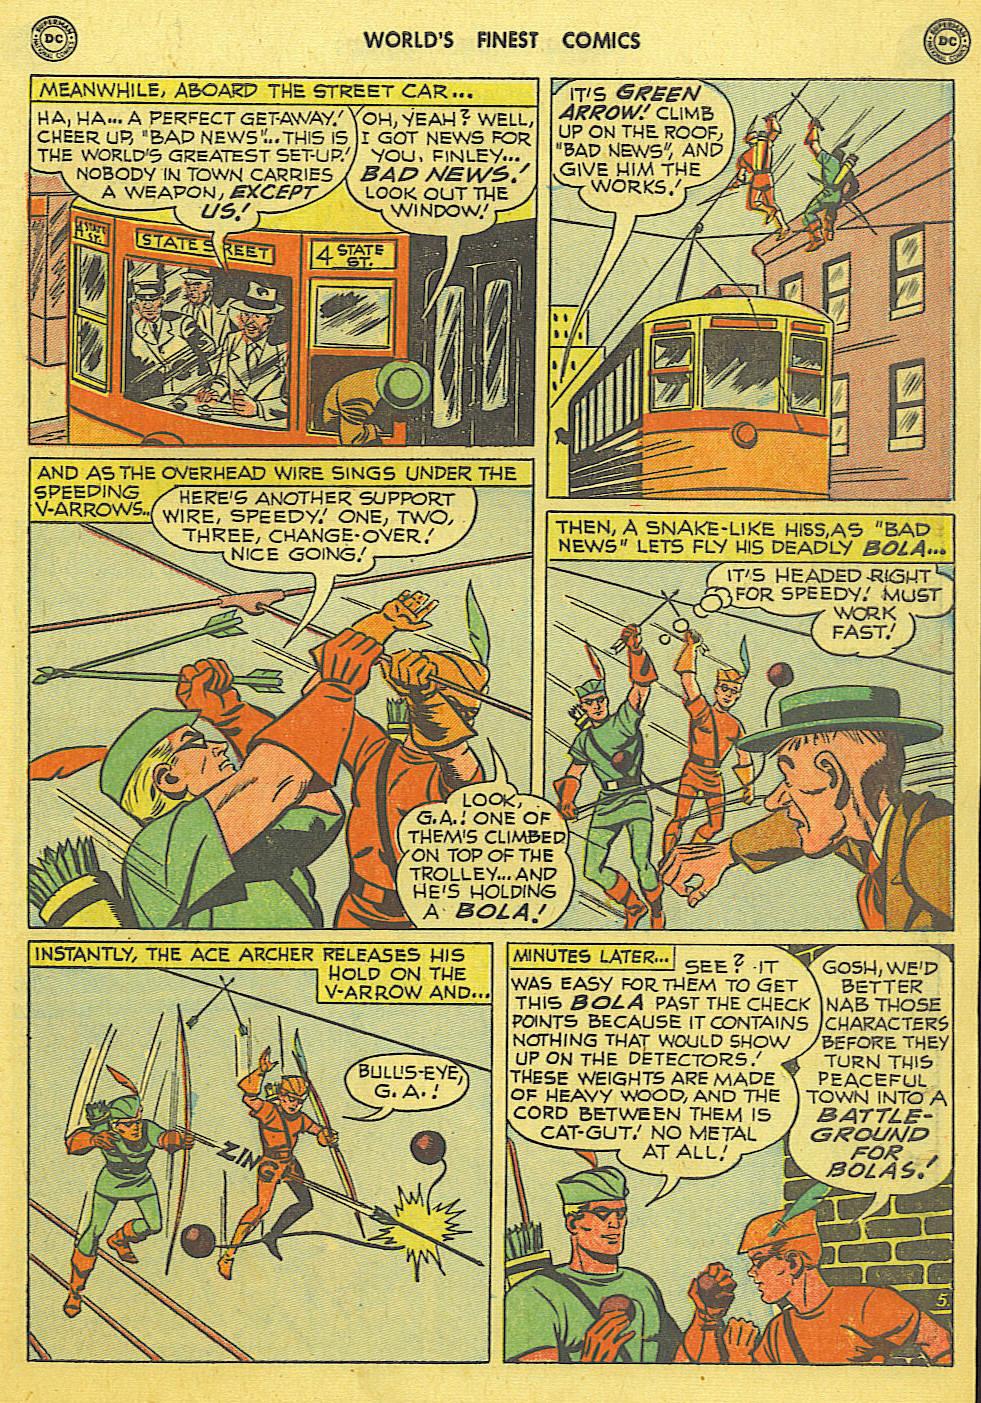 Read online World's Finest Comics comic -  Issue #49 - 22